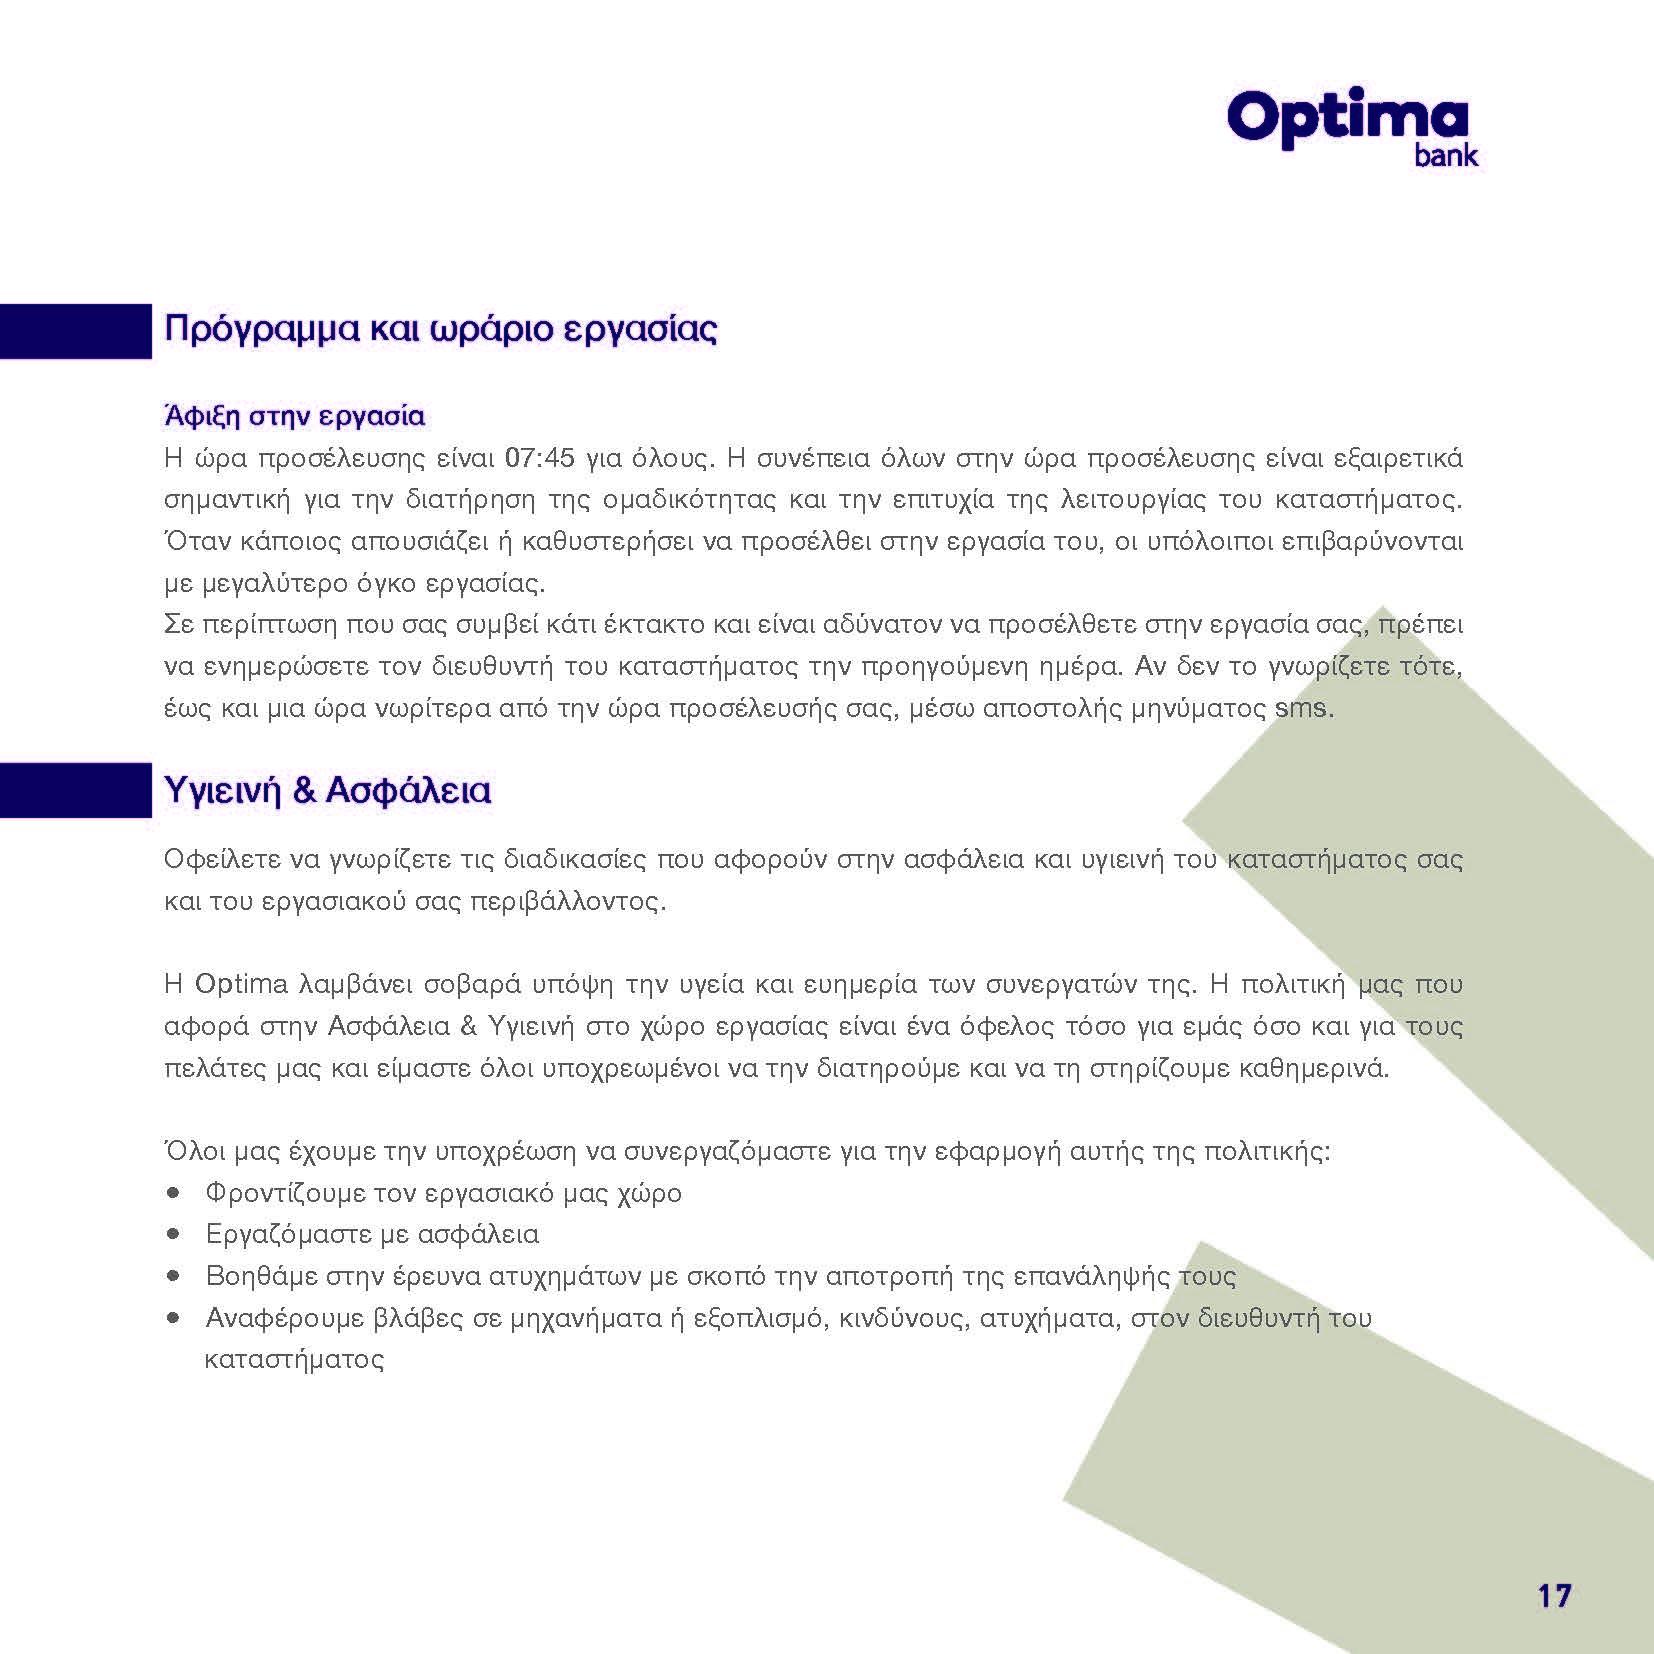 https://www.jib.gr/wp-content/uploads/2020/09/OPTIMA-BANK-BOOKLET-WEB_Page_017.jpg